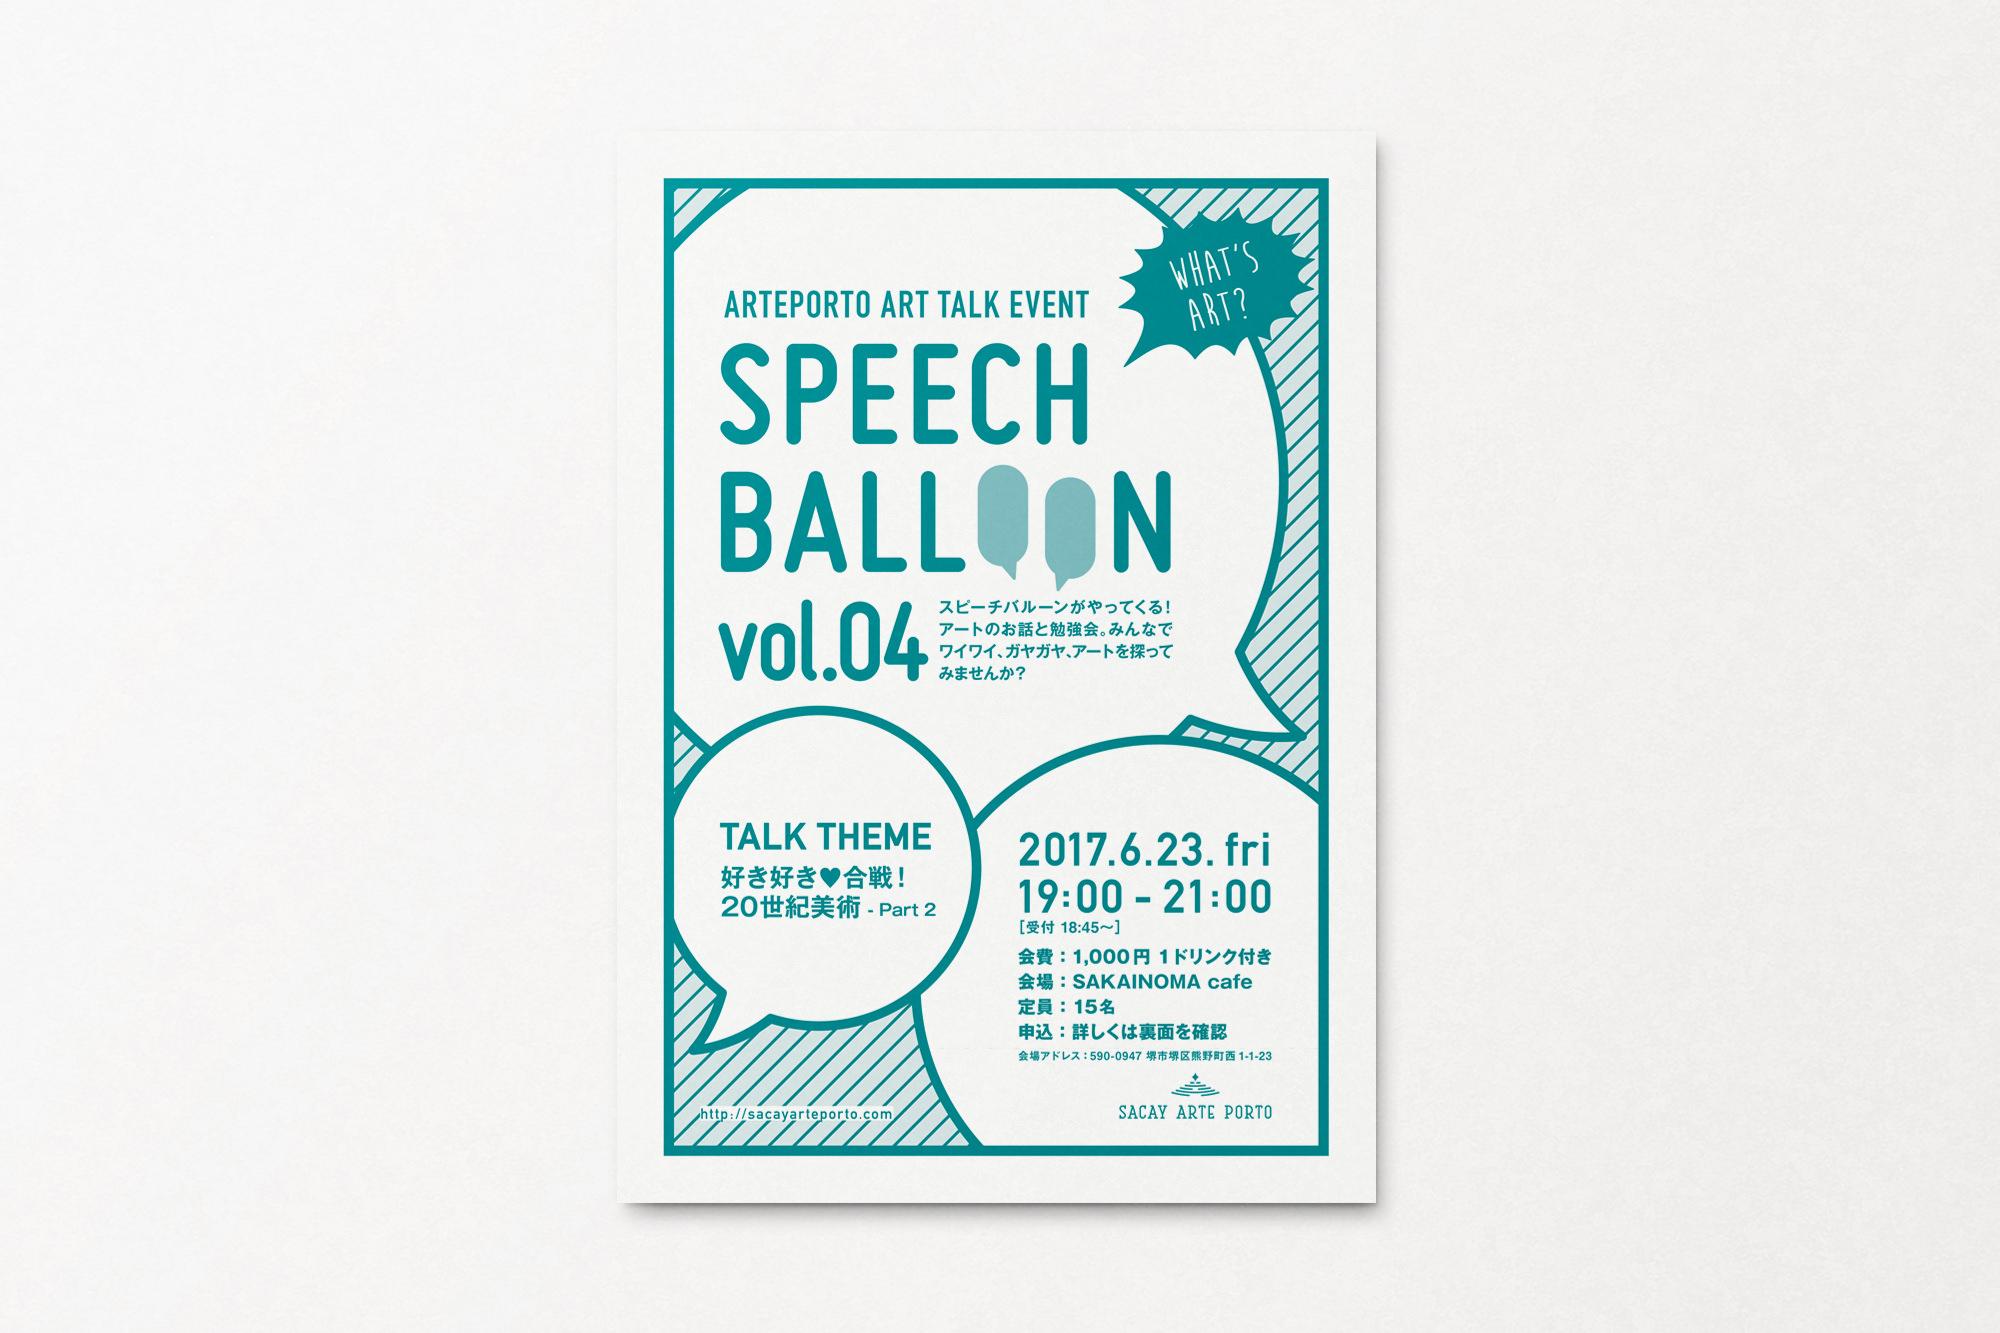 ARTEPORTO ART TALK EVENT SPEECH BALLOON vol.04